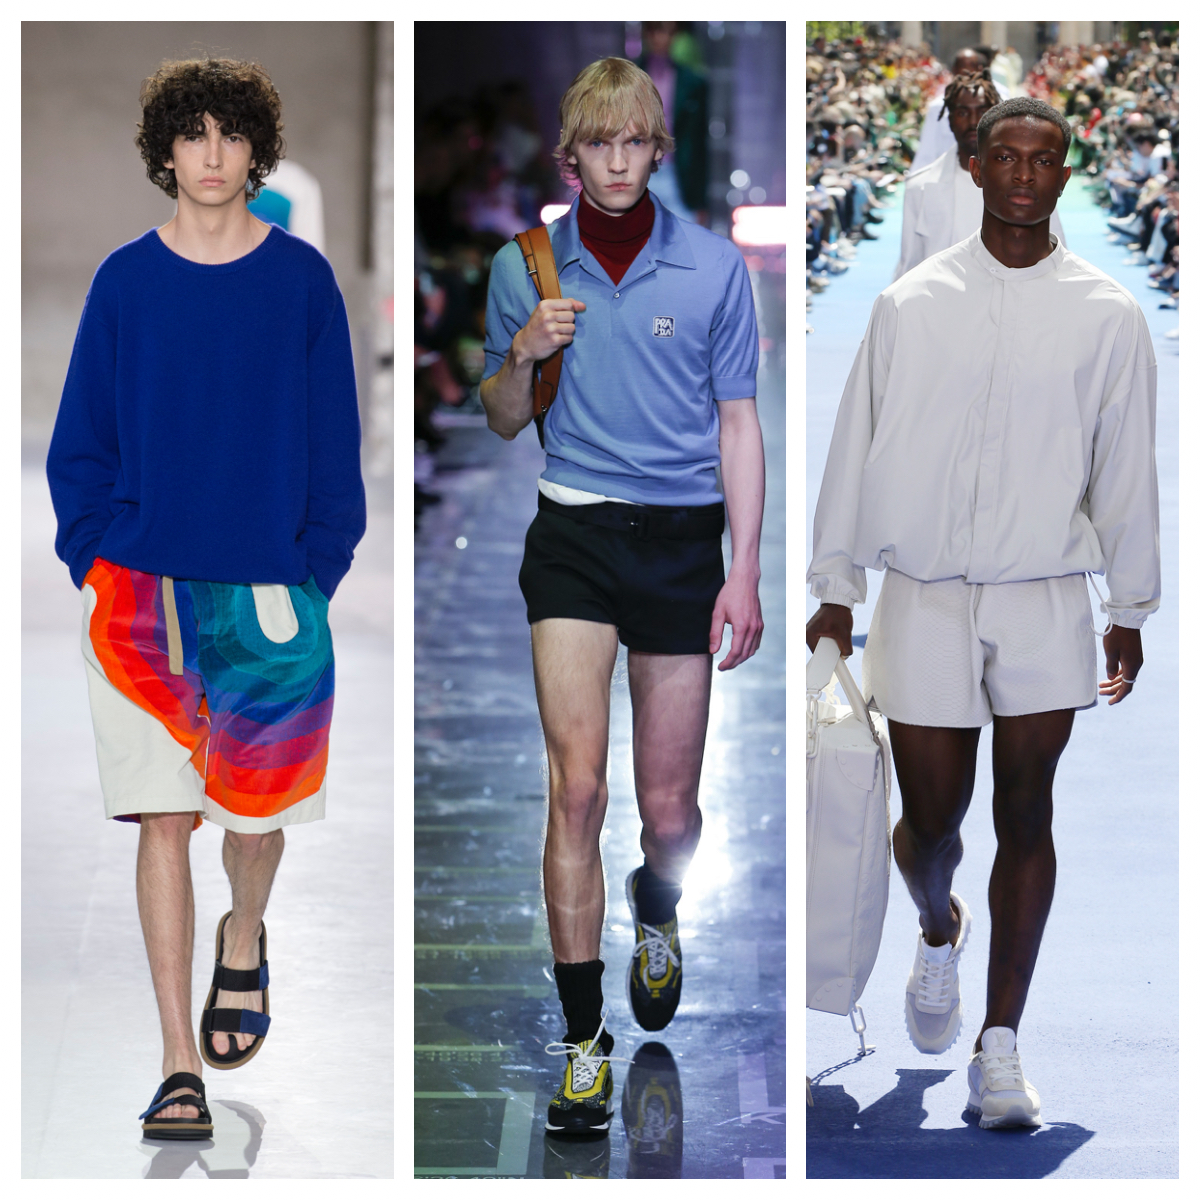 7 key menswear trends for Spring/Summer 2019